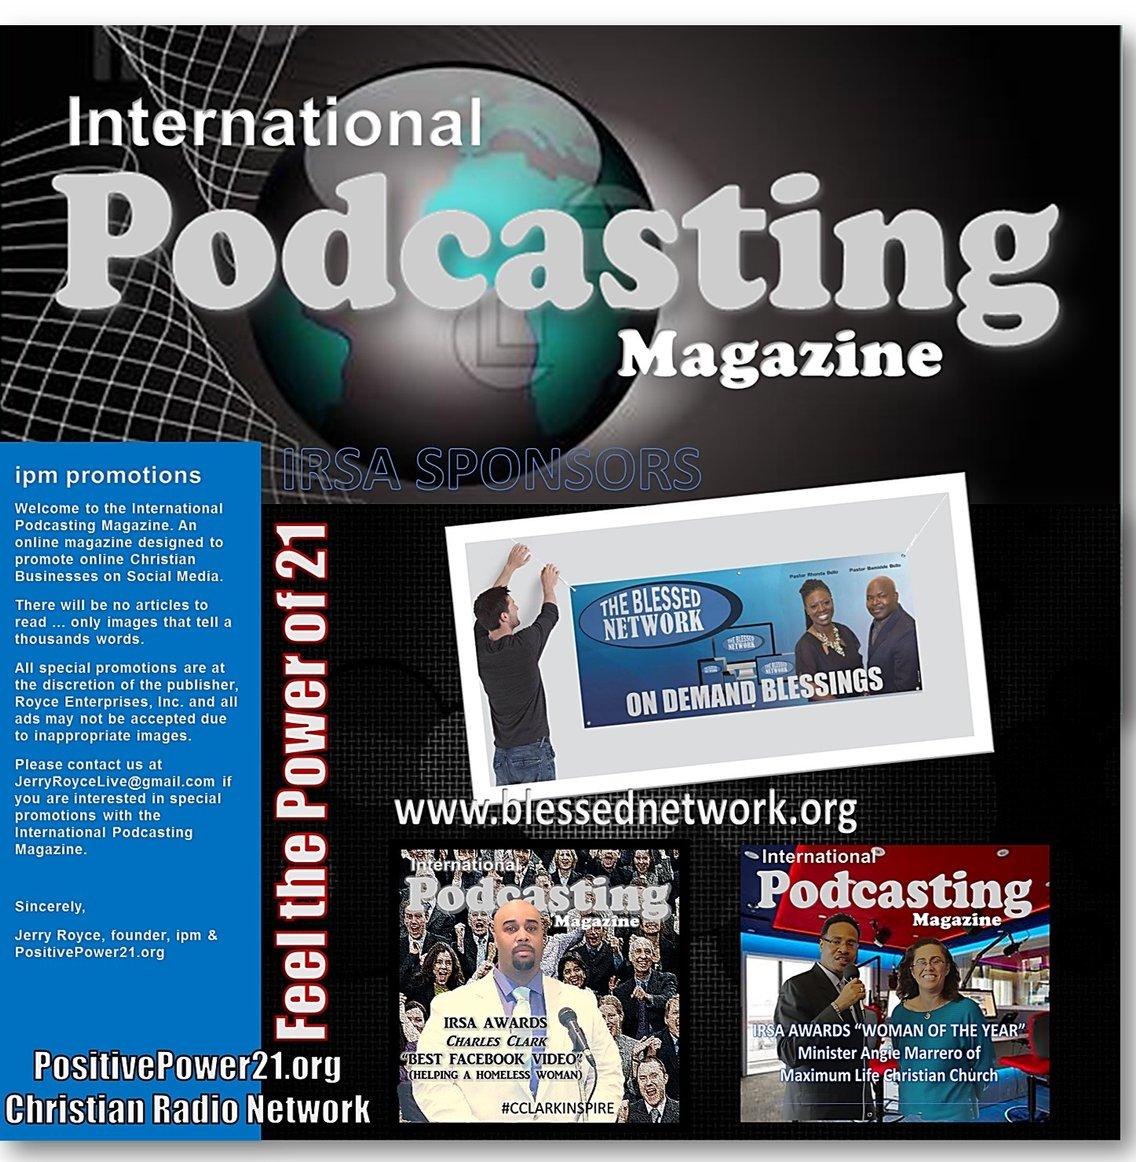 INTERNATIONAL PODCASTING MAGAZINE (IPM) - immagine di copertina